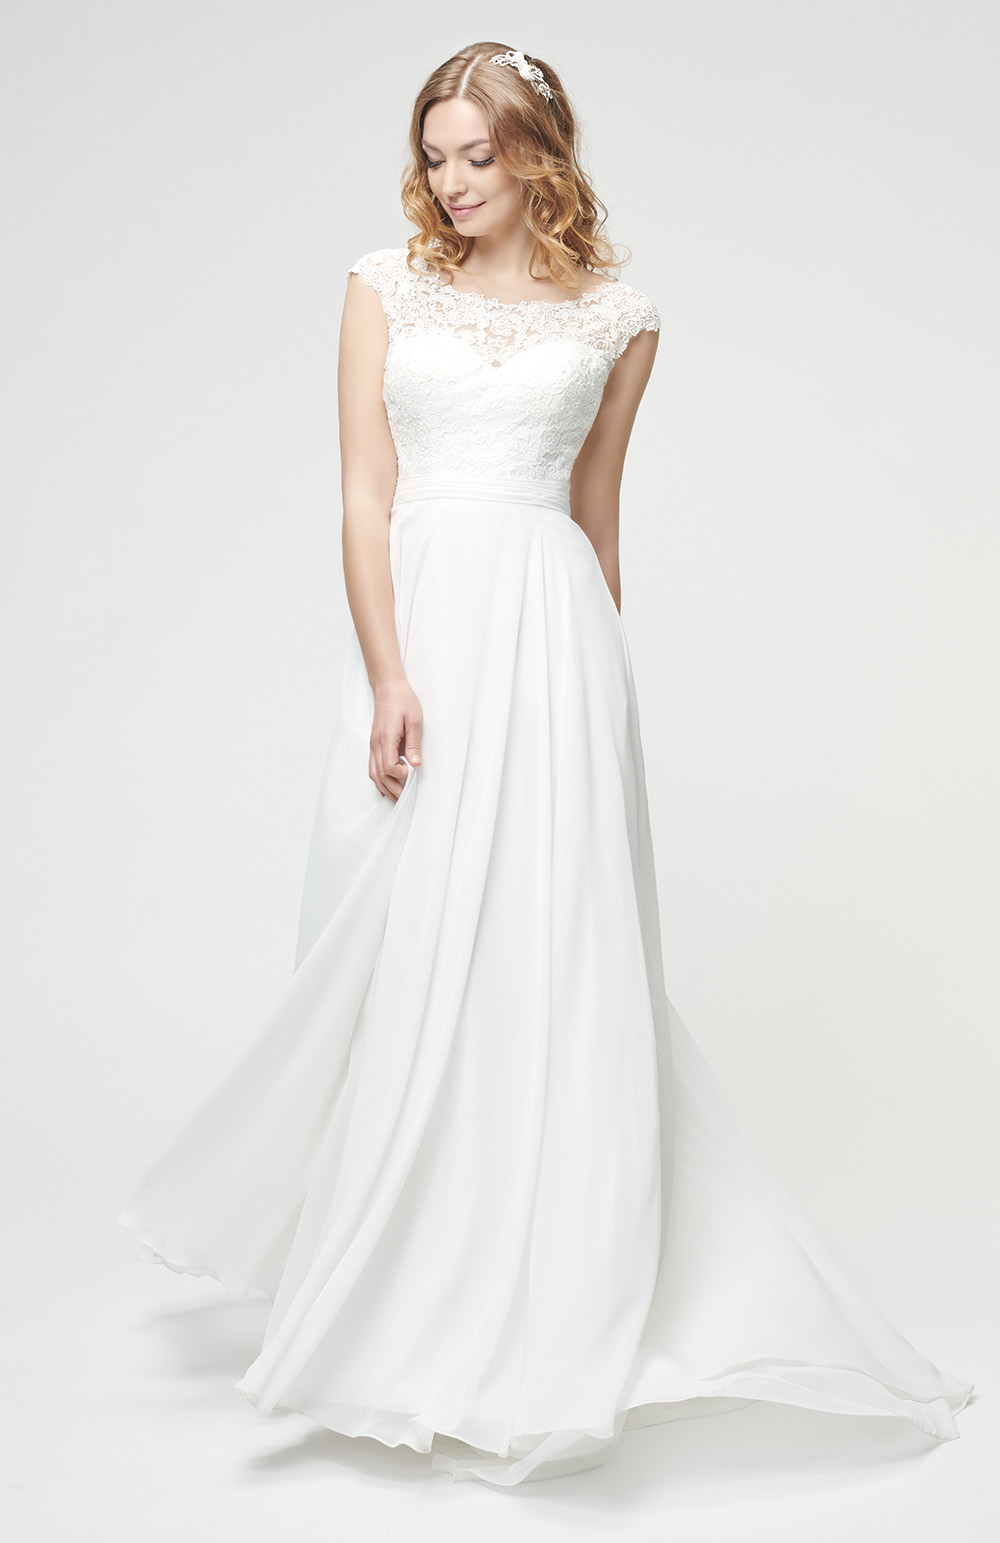 Robe de mariée Modèle Regan